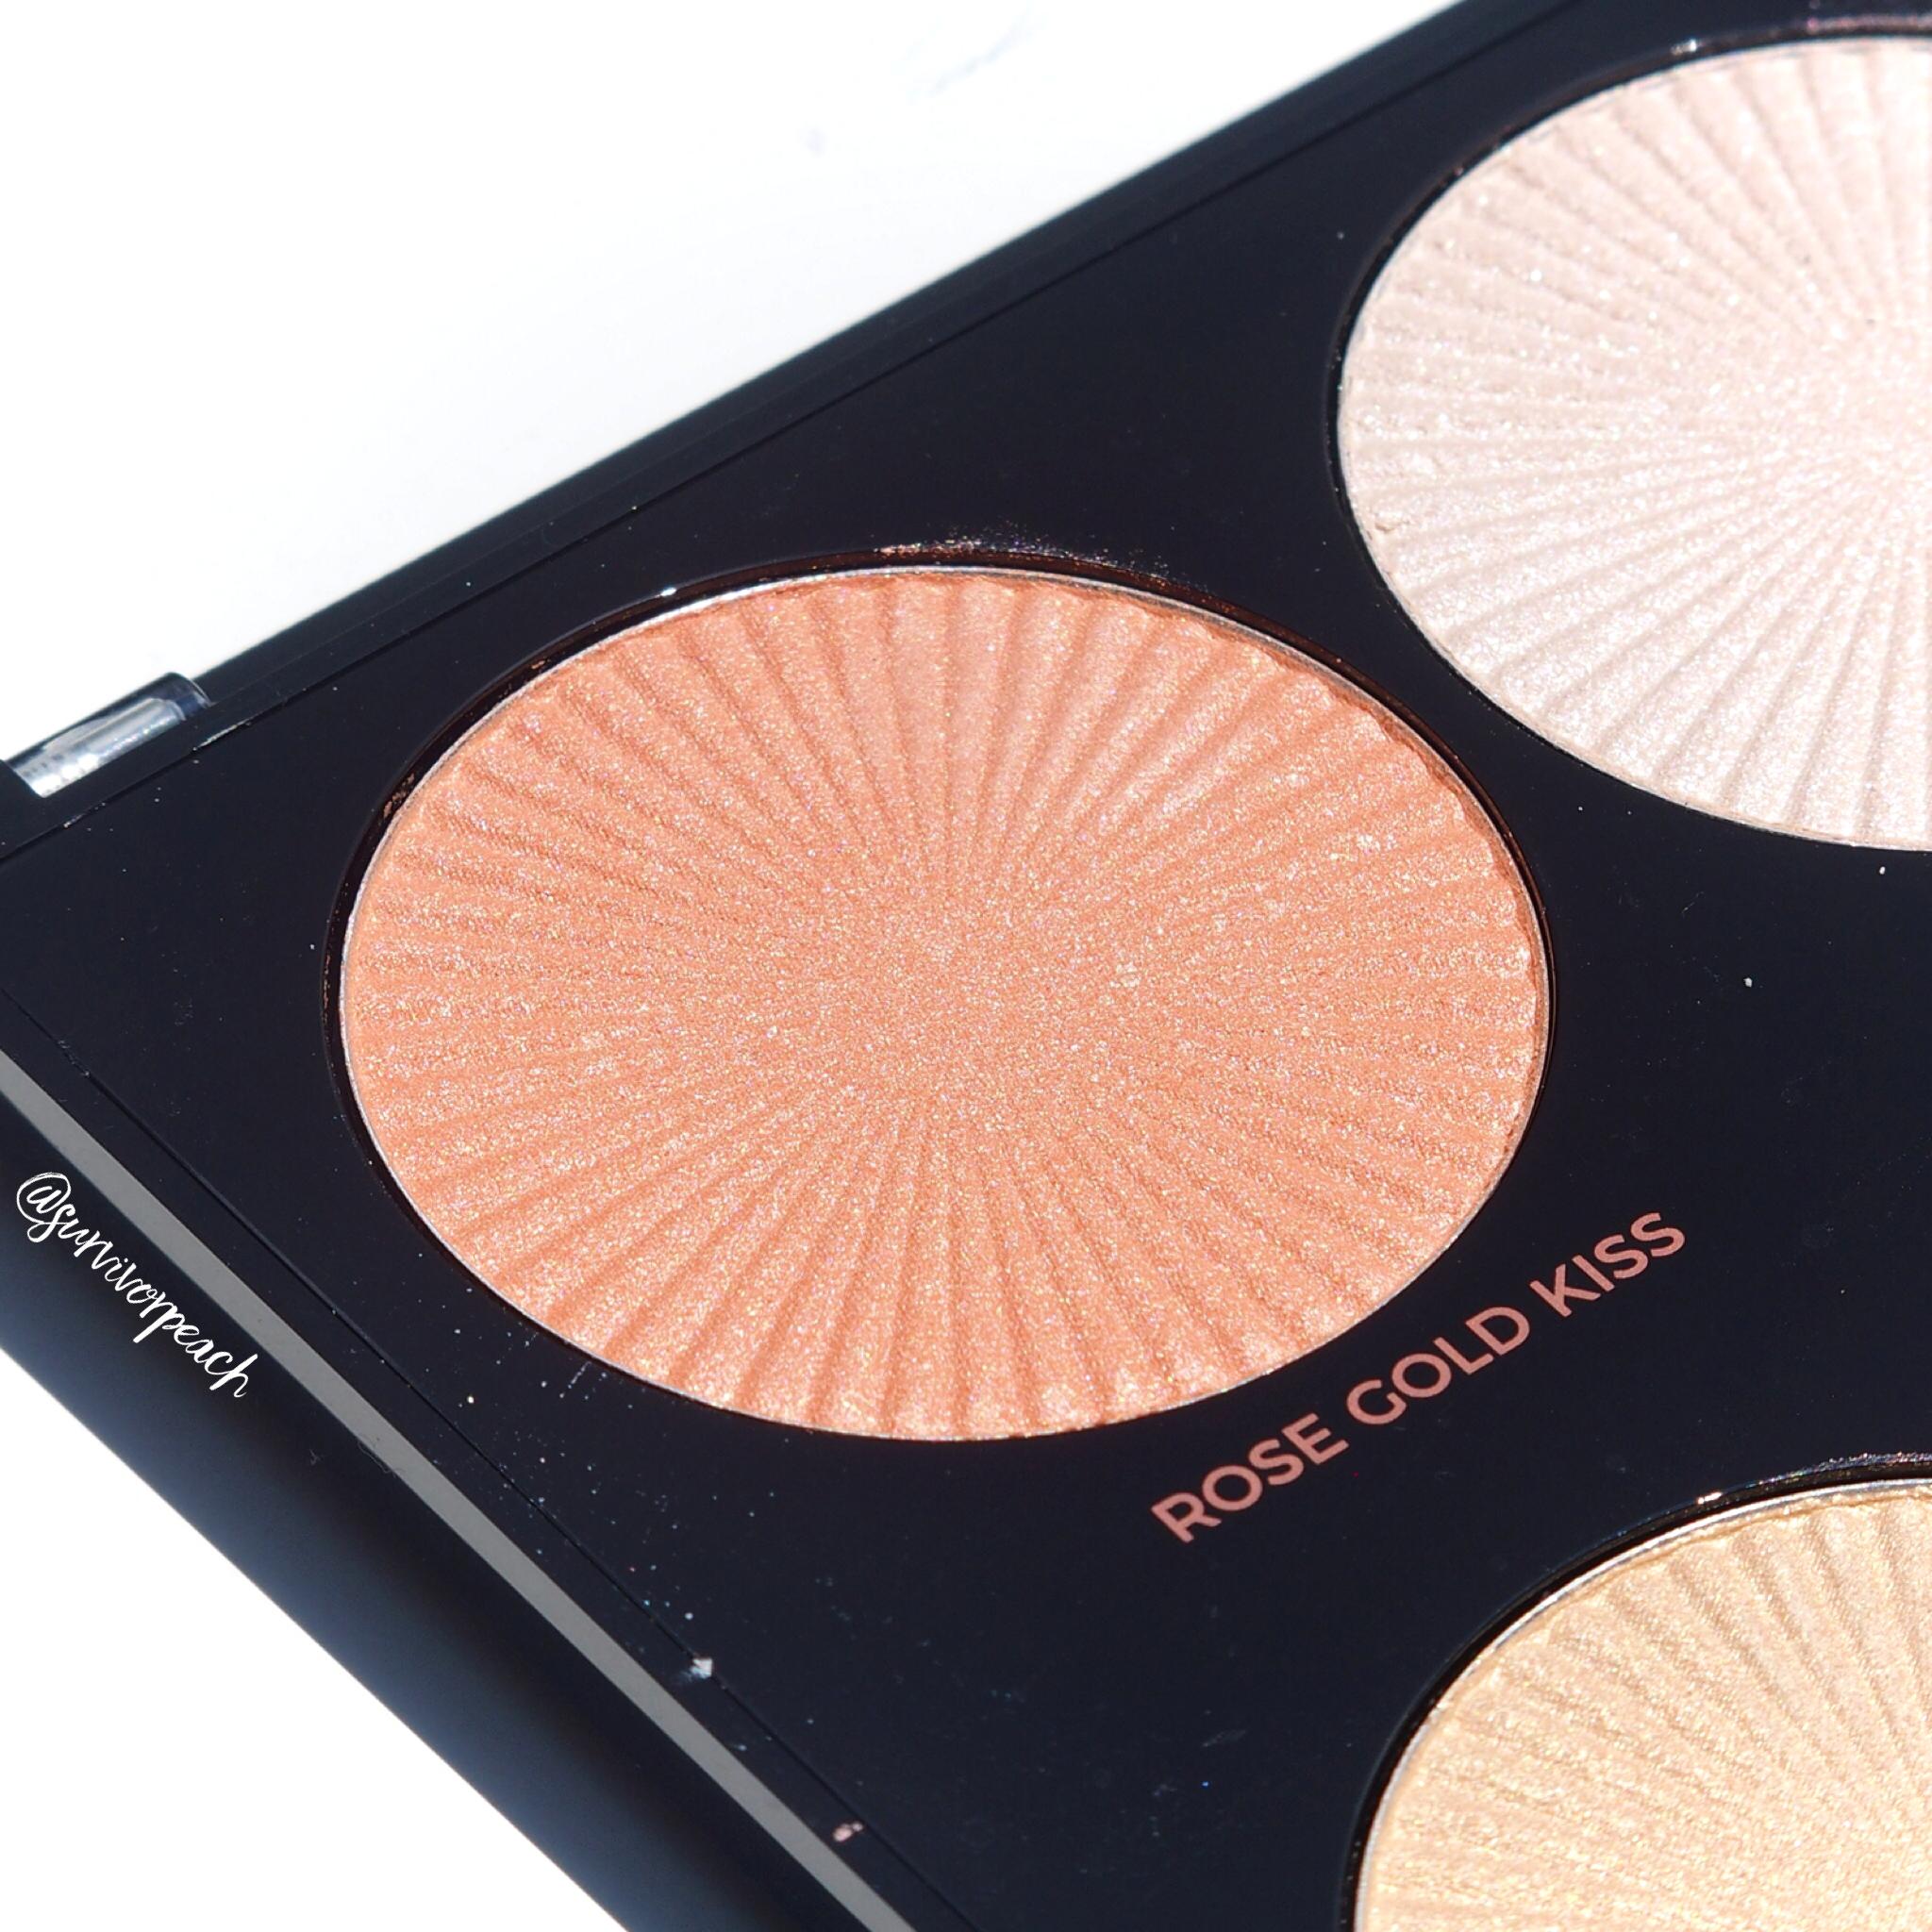 Makeup Revolution Pro HD Glow Getter palette shade Rose Gold Kiss